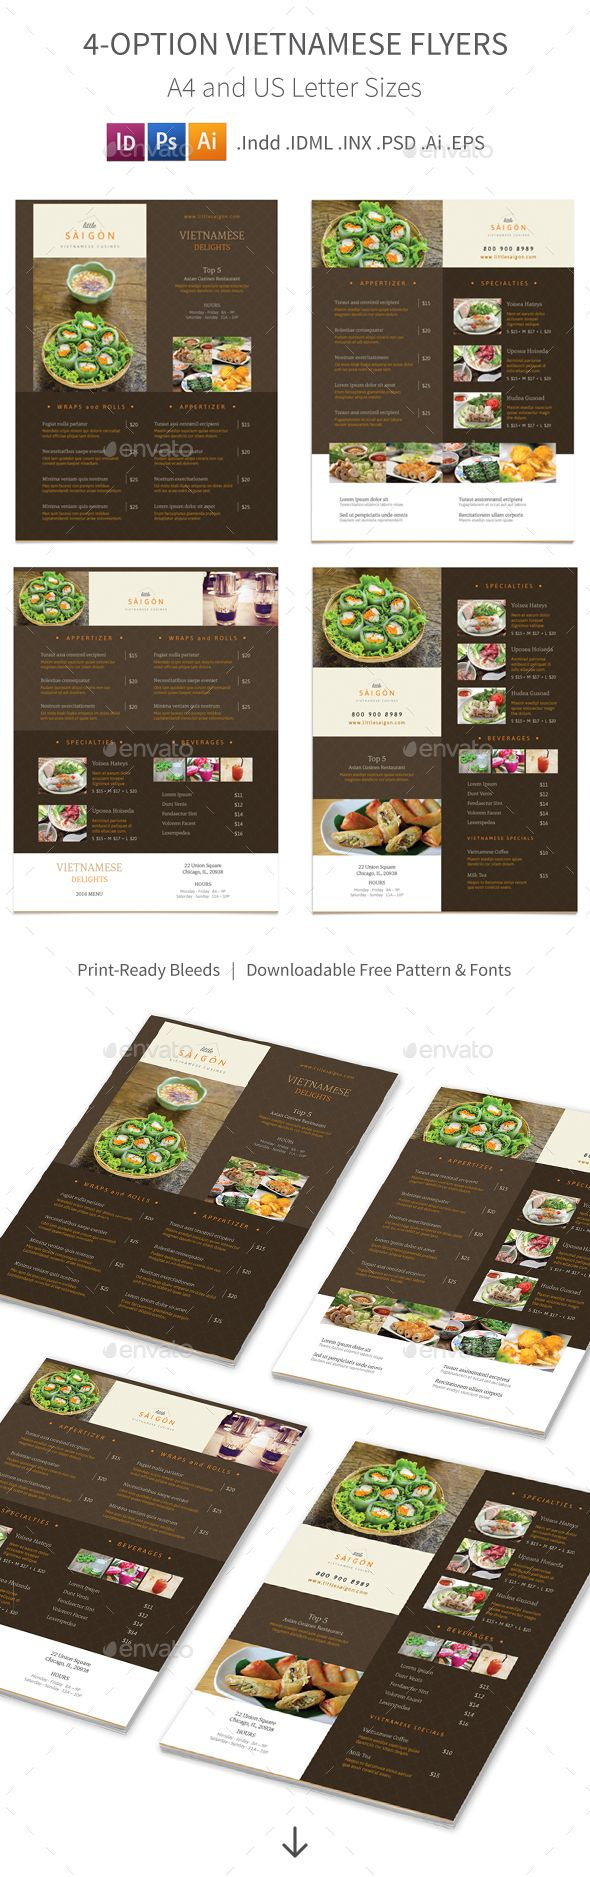 Vietnamese Restaurant Menu Flyers 2 鈥?204 Options by Mike_pantone *Save with Bundle! Vietnamese Menu Print Bundle is also available.Vietnamese Restaurant Menu Flyers 2 鈥?204 Options Clean and modern